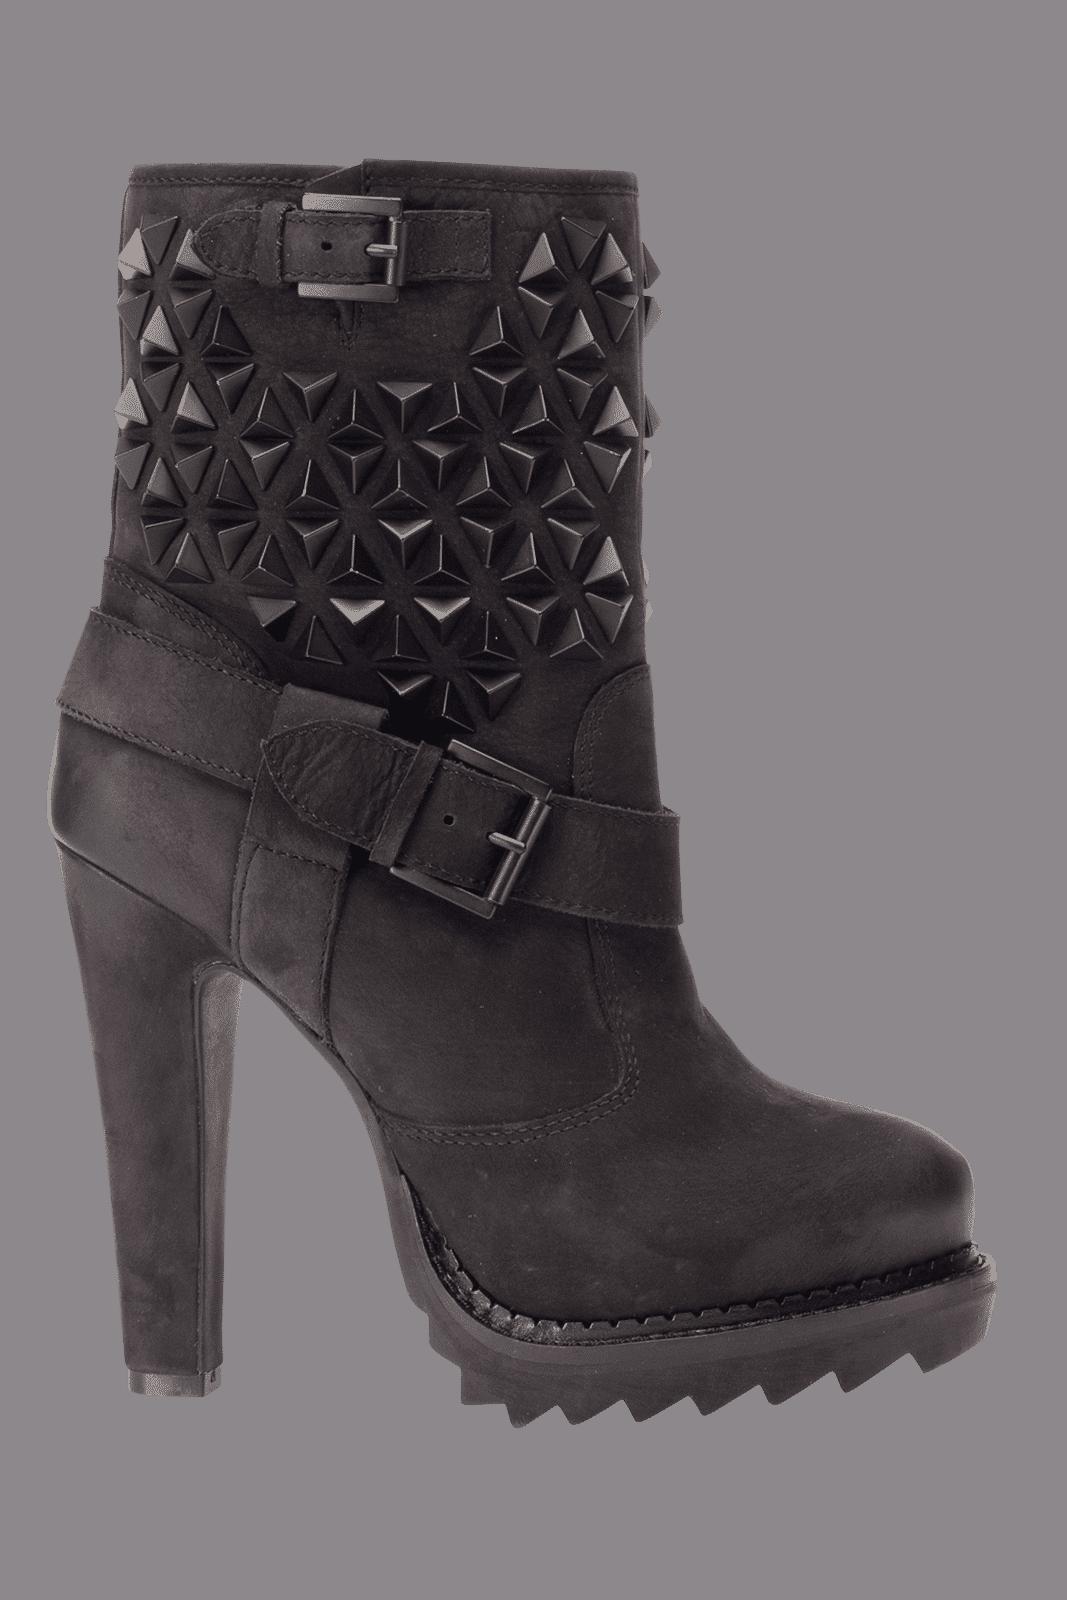 Ash Stivali Main Line Ankle Boots Desire Bis Black